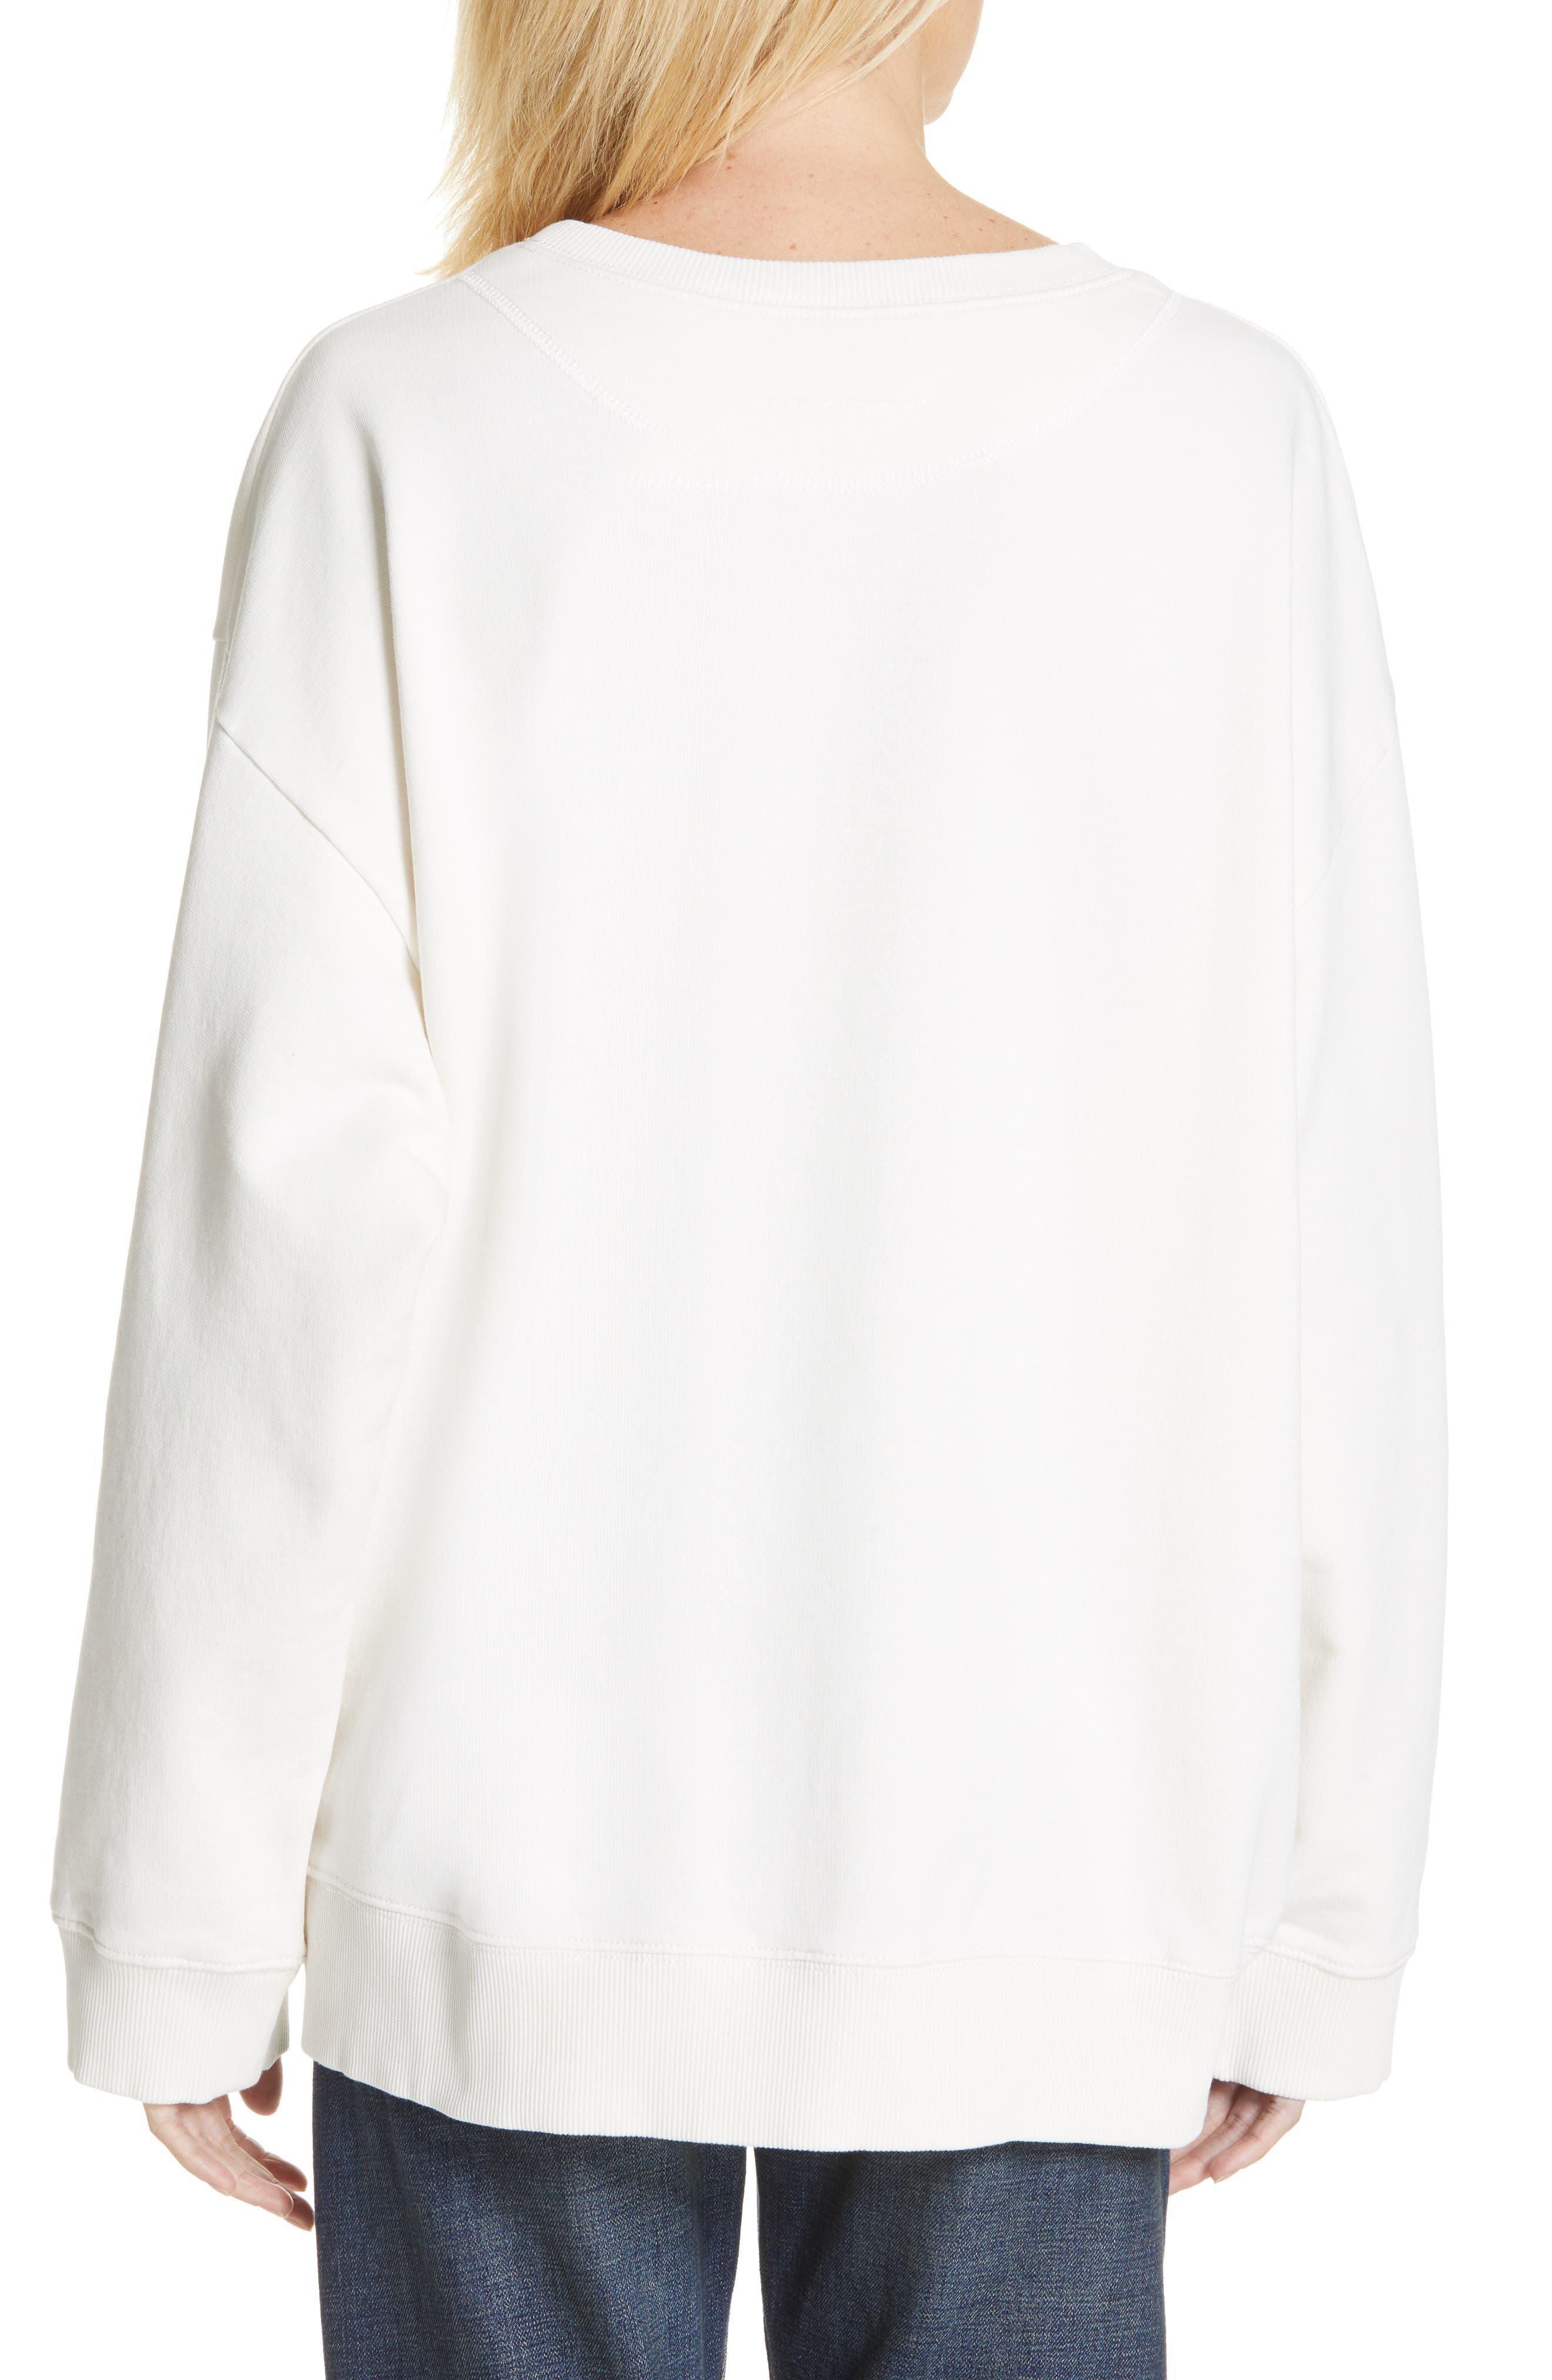 MM6 MAISON MARGIELA,                             Kidswear Mascot Graphic Sweatshirt,                             Alternate thumbnail 2, color,                             OFF WHITE